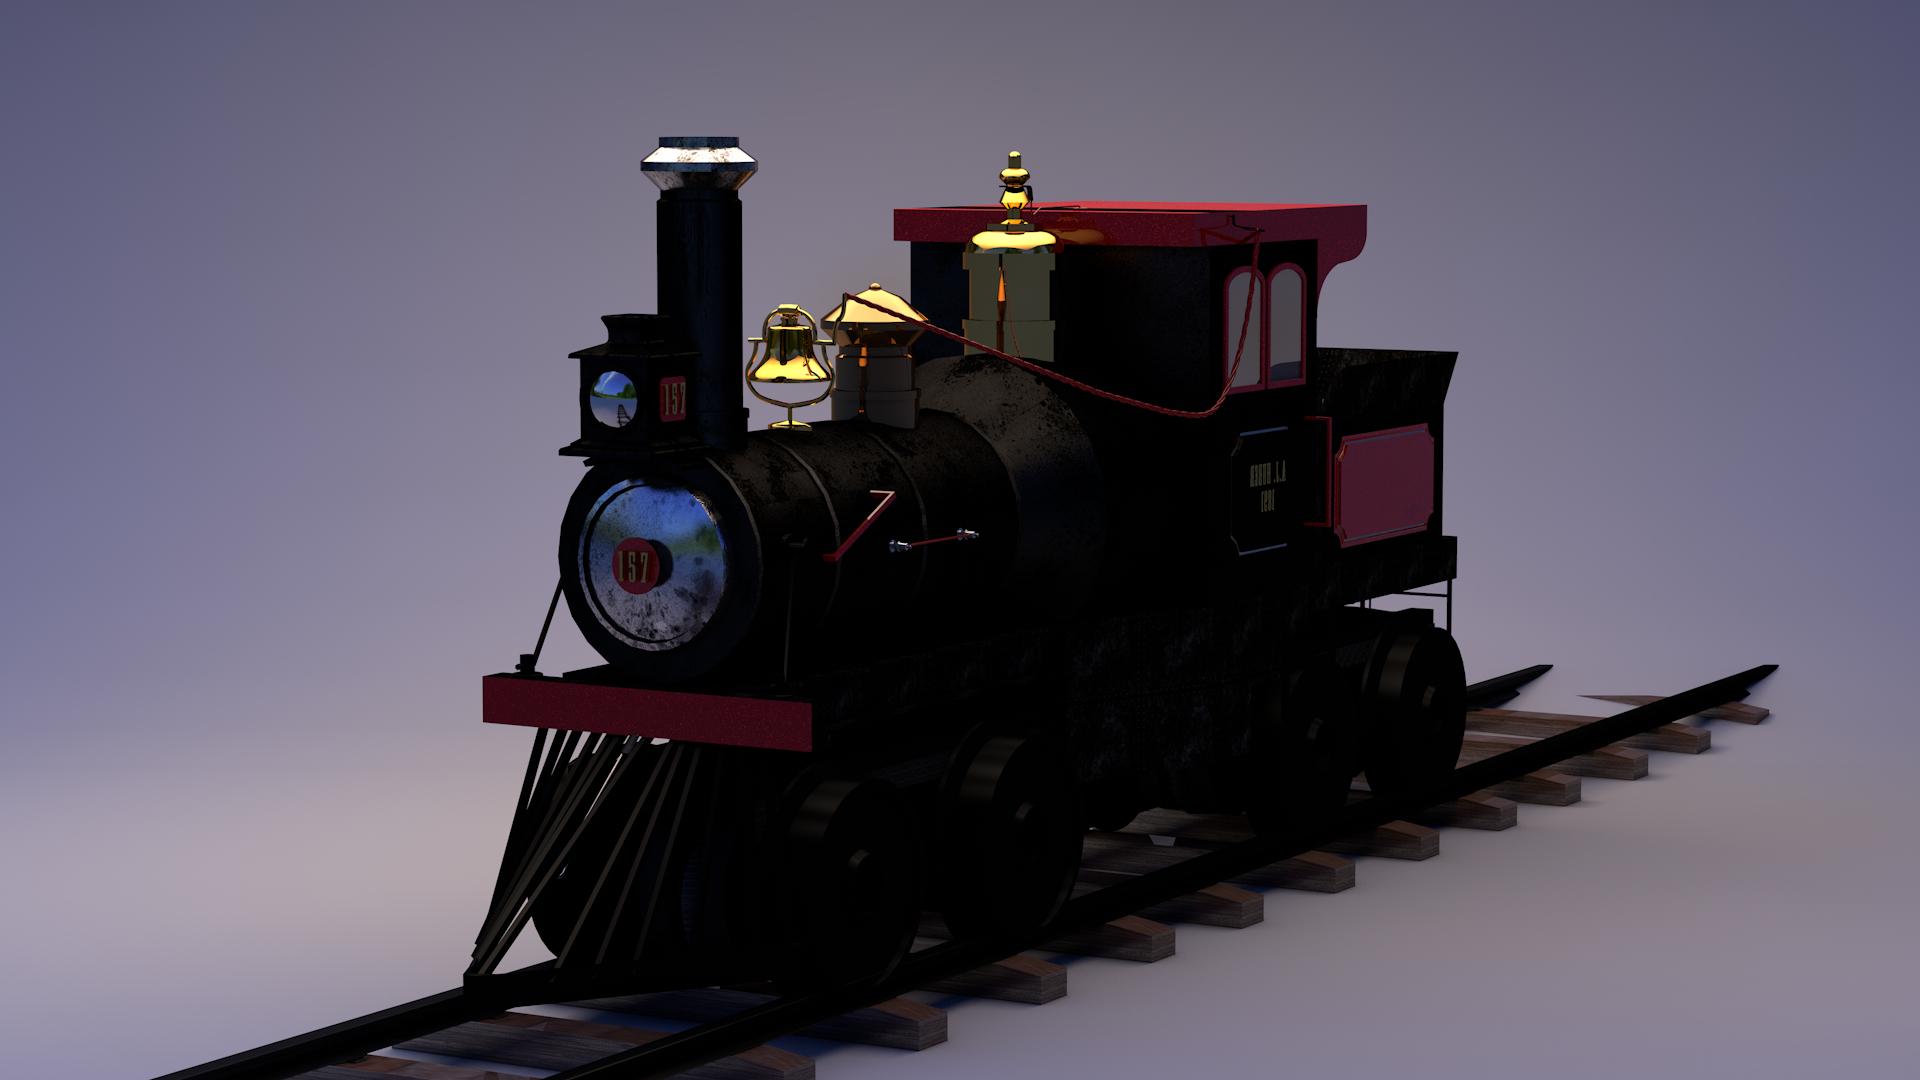 паровоза залізниця в Cinema 4d maxwell render зображення